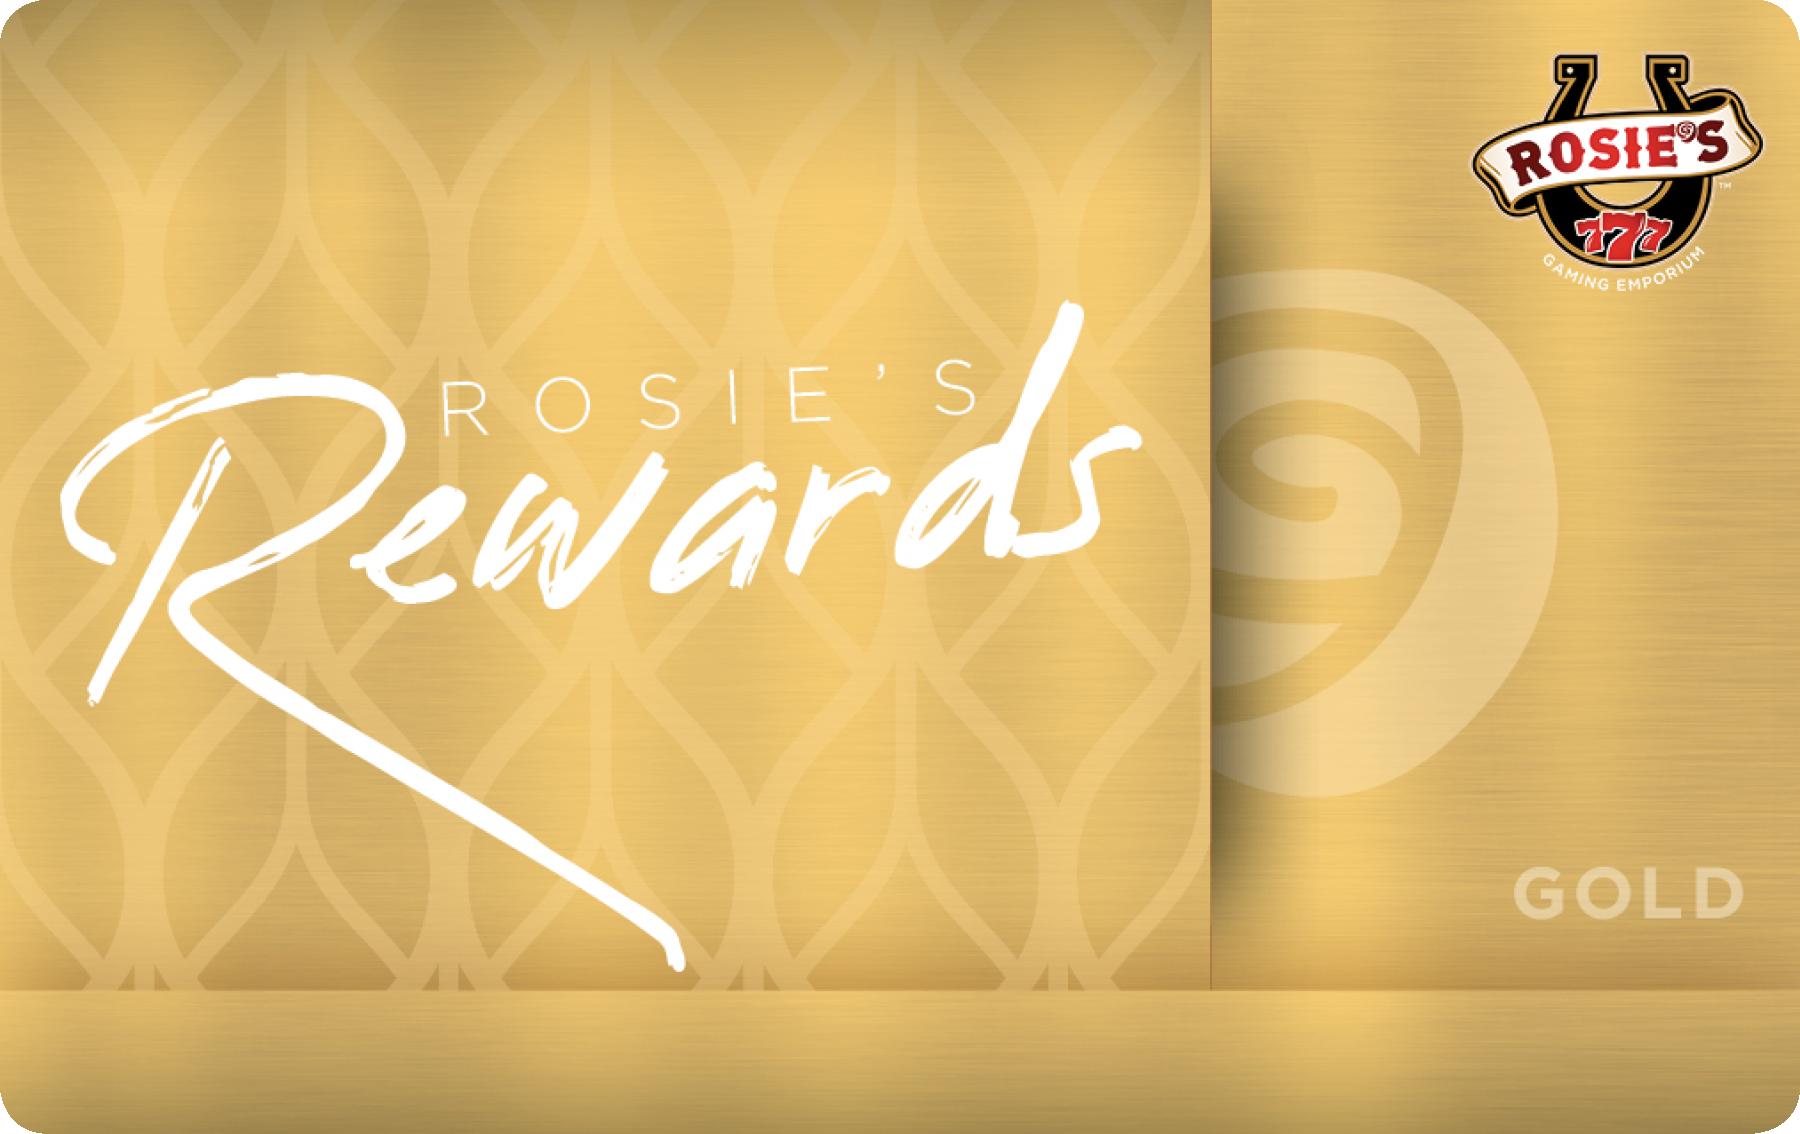 Rosies Gold Rewards Card